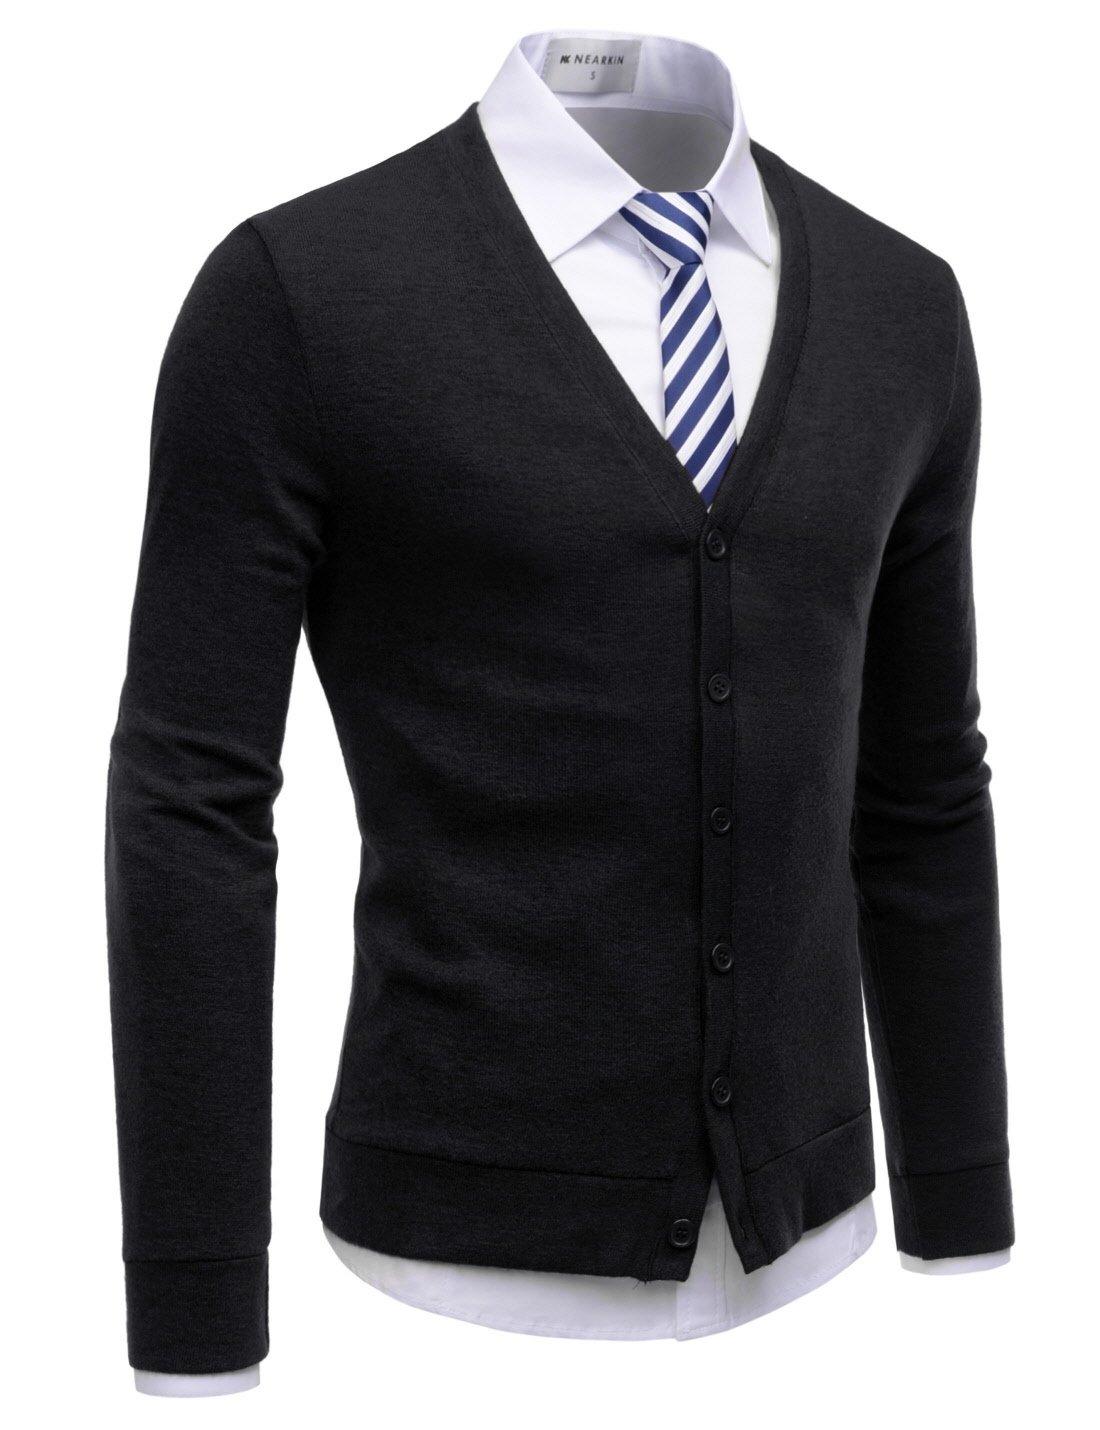 NEARKIN (NKNKCAC1) Mens Knitwear City Casual Slim Cut Long Sleeve Cardigan Sweaters BLACK US M(Tag size M)